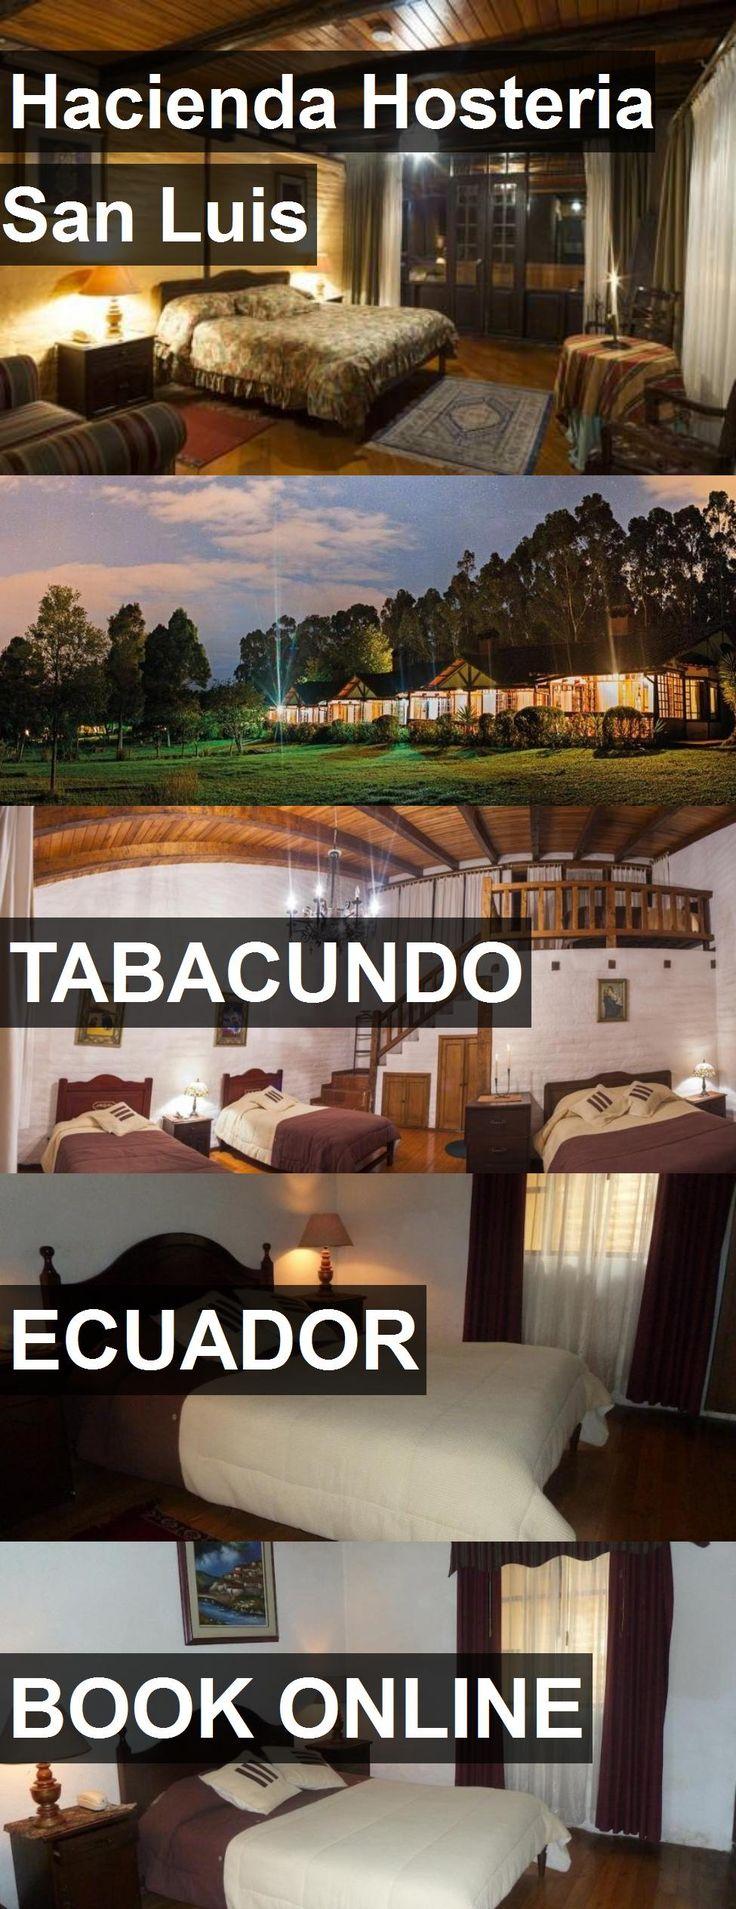 Hotel Hacienda Hosteria San Luis in Tabacundo, Ecuador. For more information, photos, reviews and best prices please follow the link. #Ecuador #Tabacundo #travel #vacation #hotel